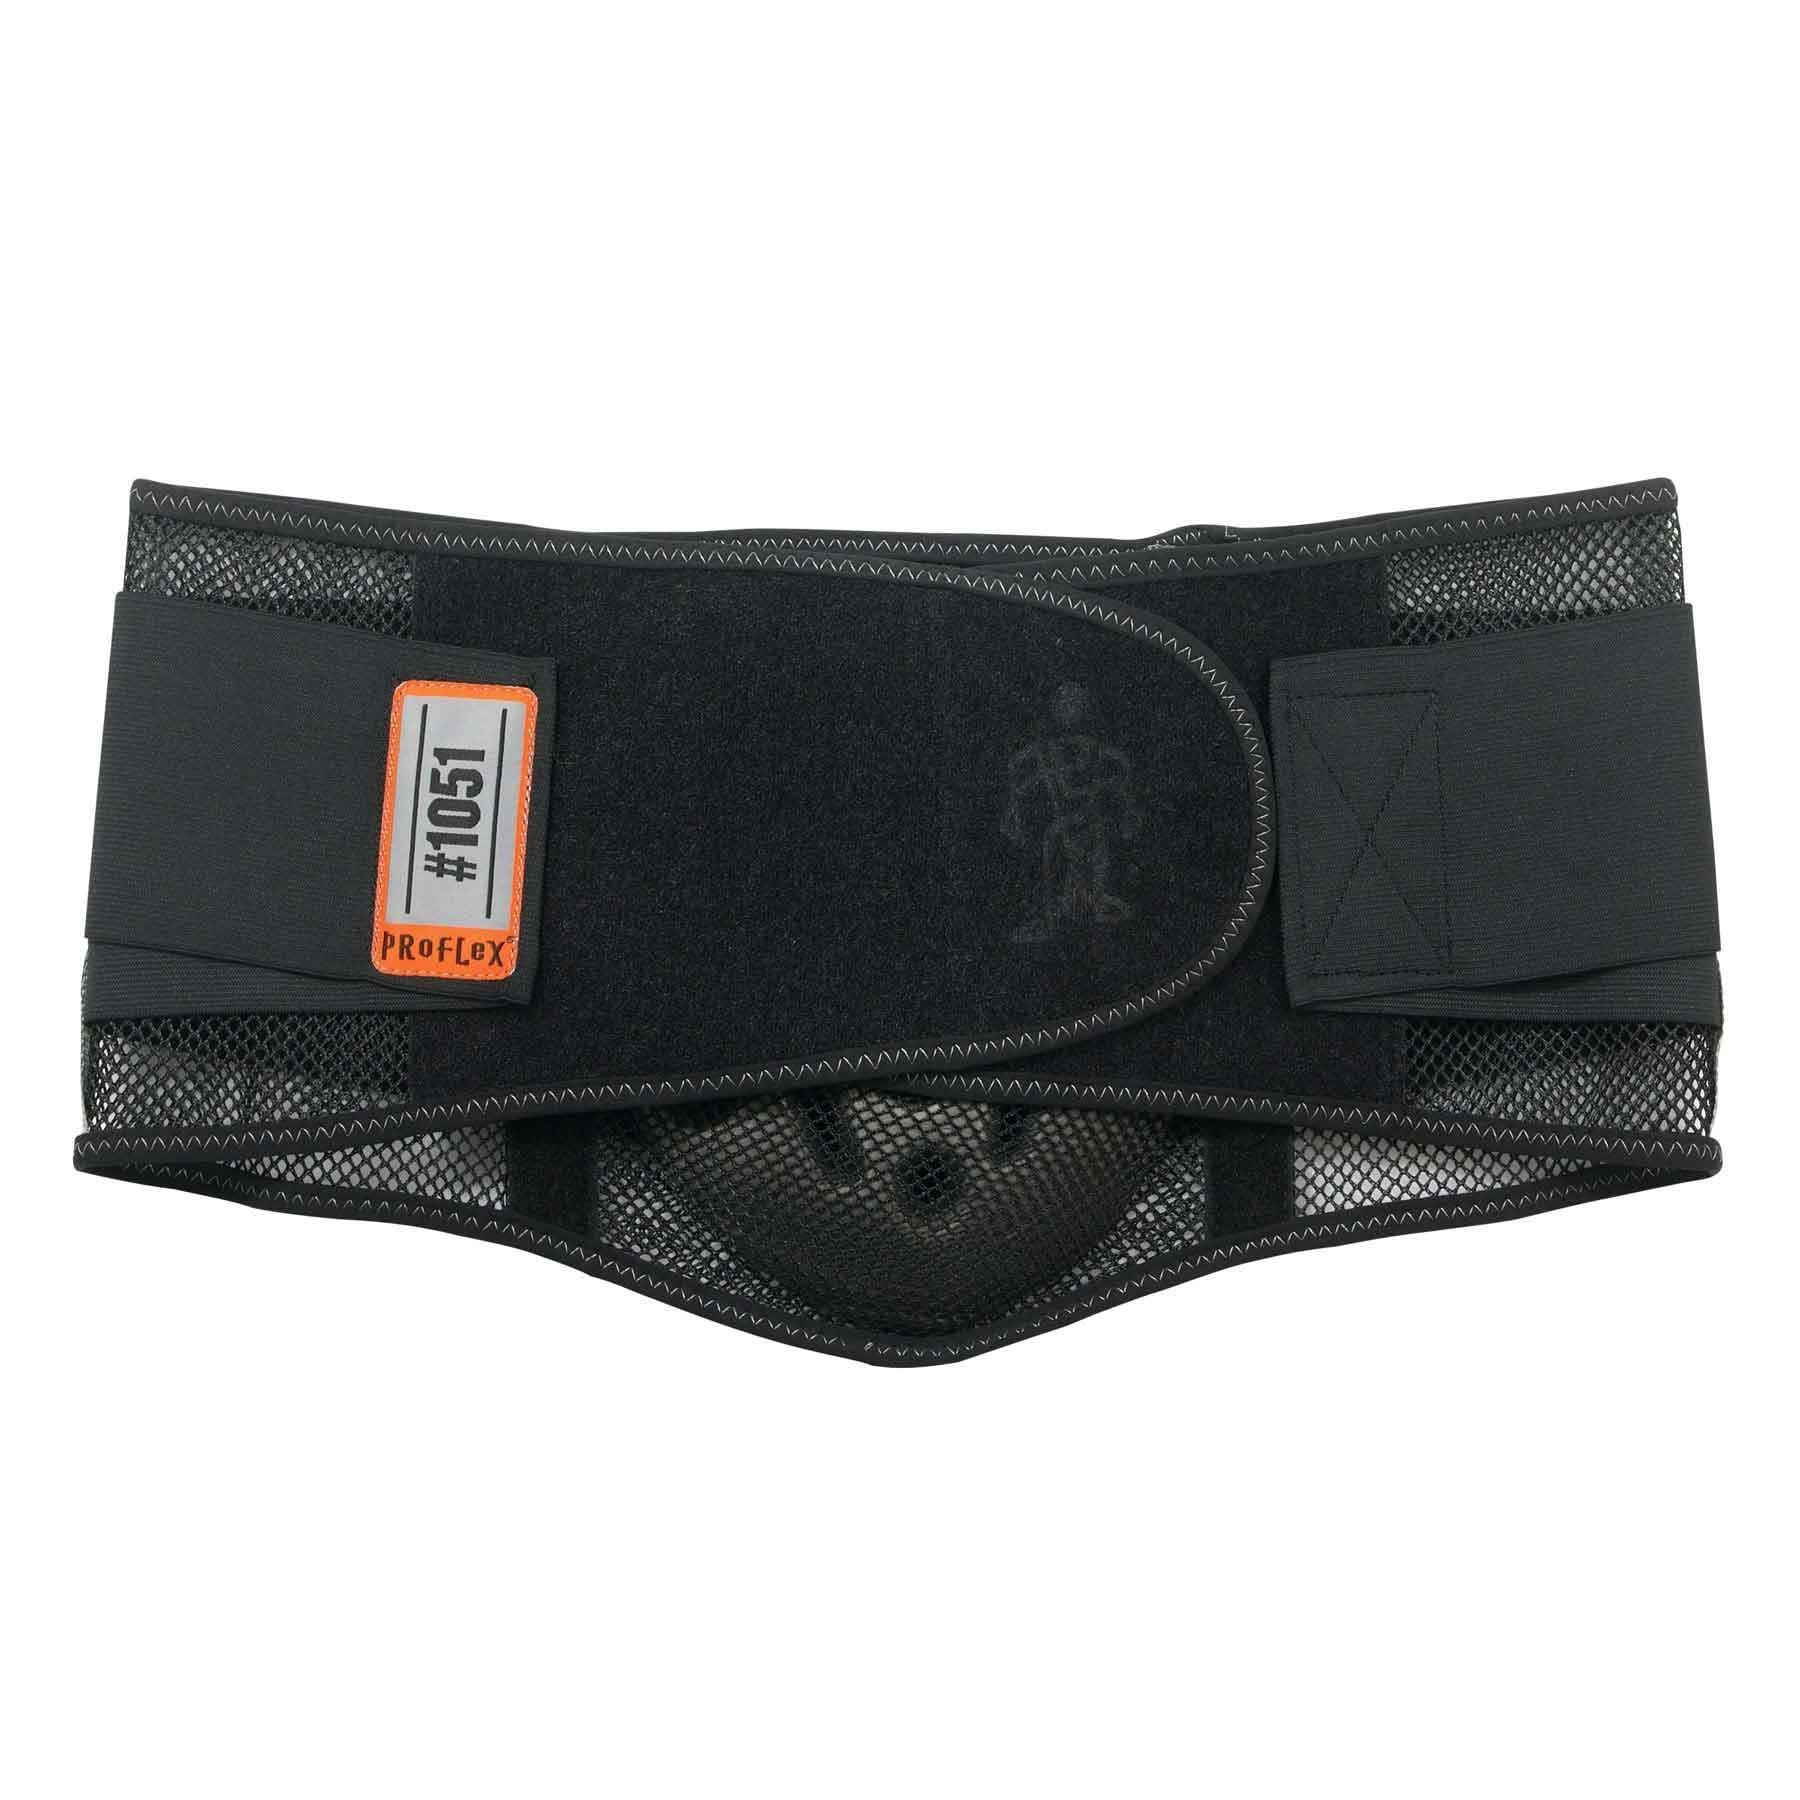 Ergodyne - 1051 XL Black Mesh Back Support w/Lumbar Pad